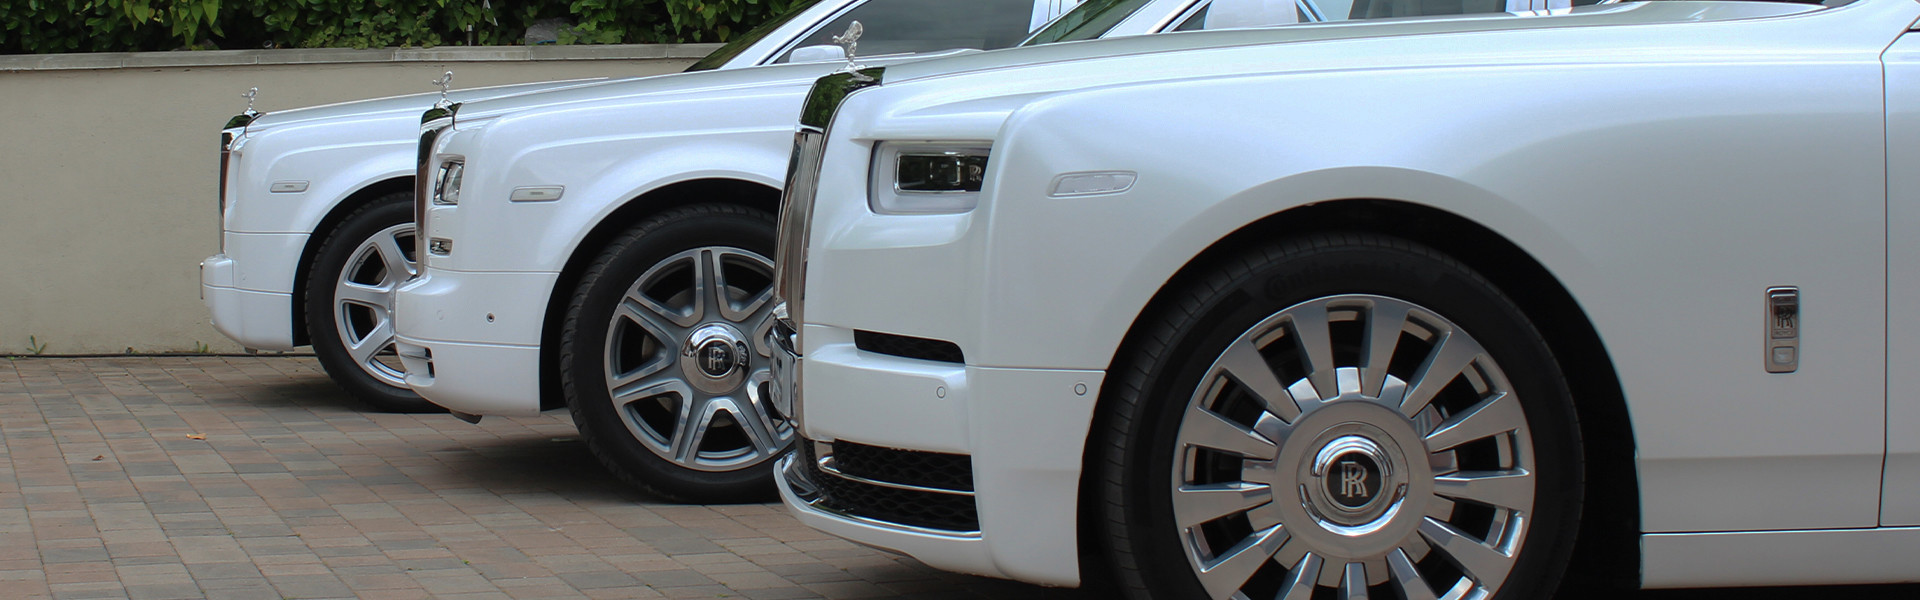 Rolls Royce Phantom fleet